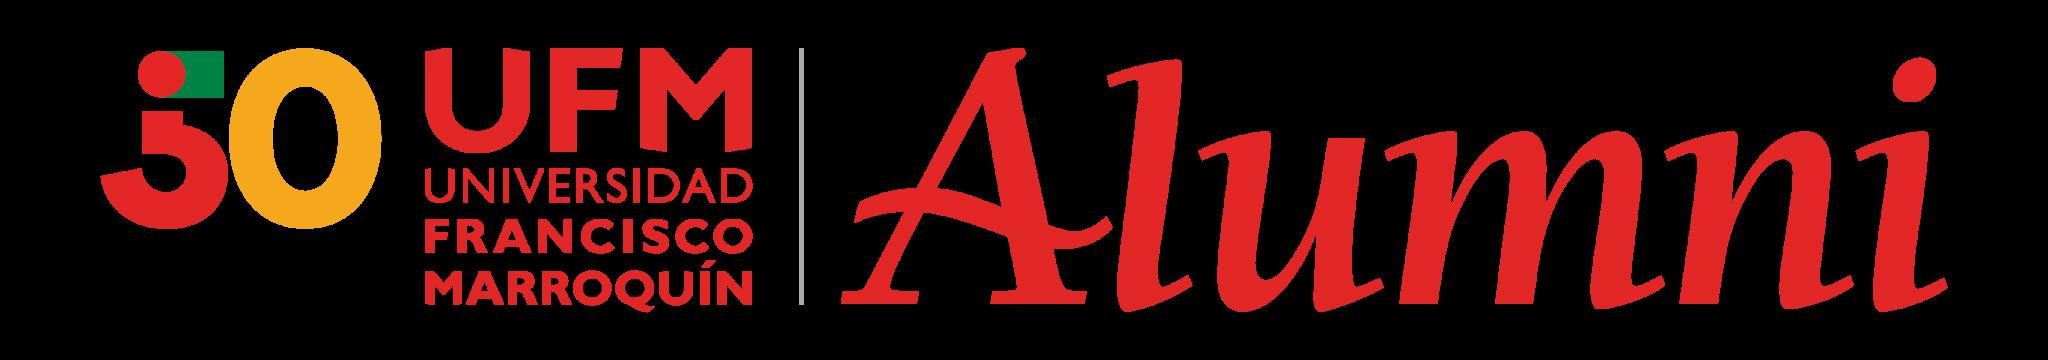 Alumni-01-1-2048x360